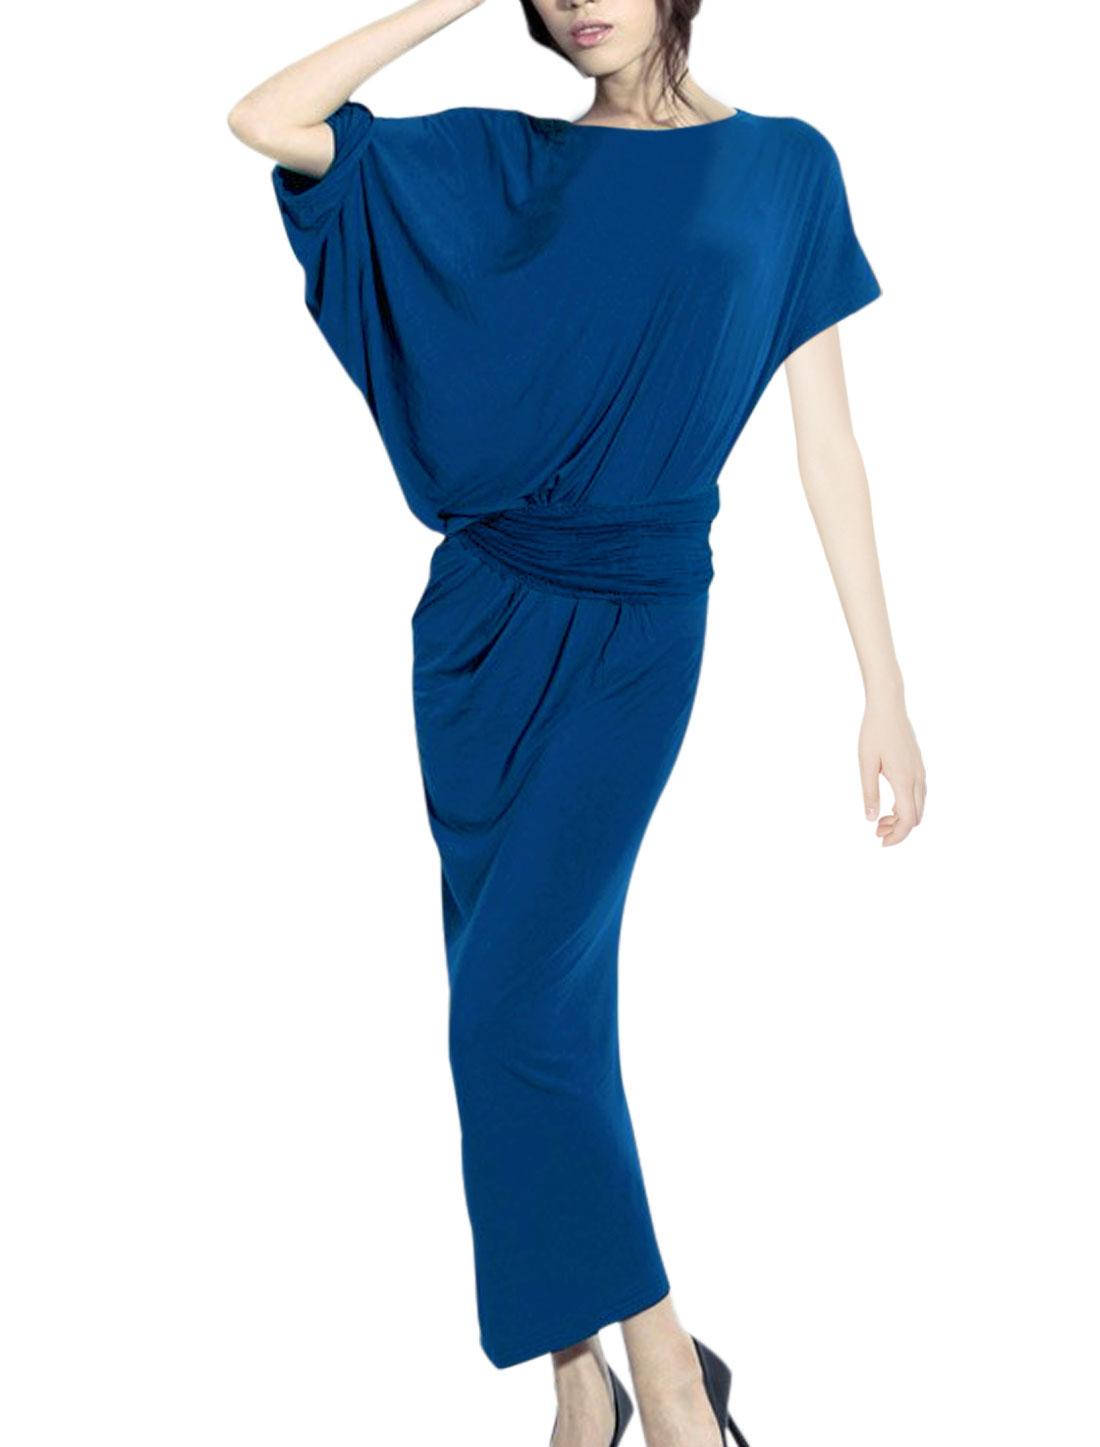 Lady Short Batwing Sleeve Closet Ring Waist Dress Royal Blue S